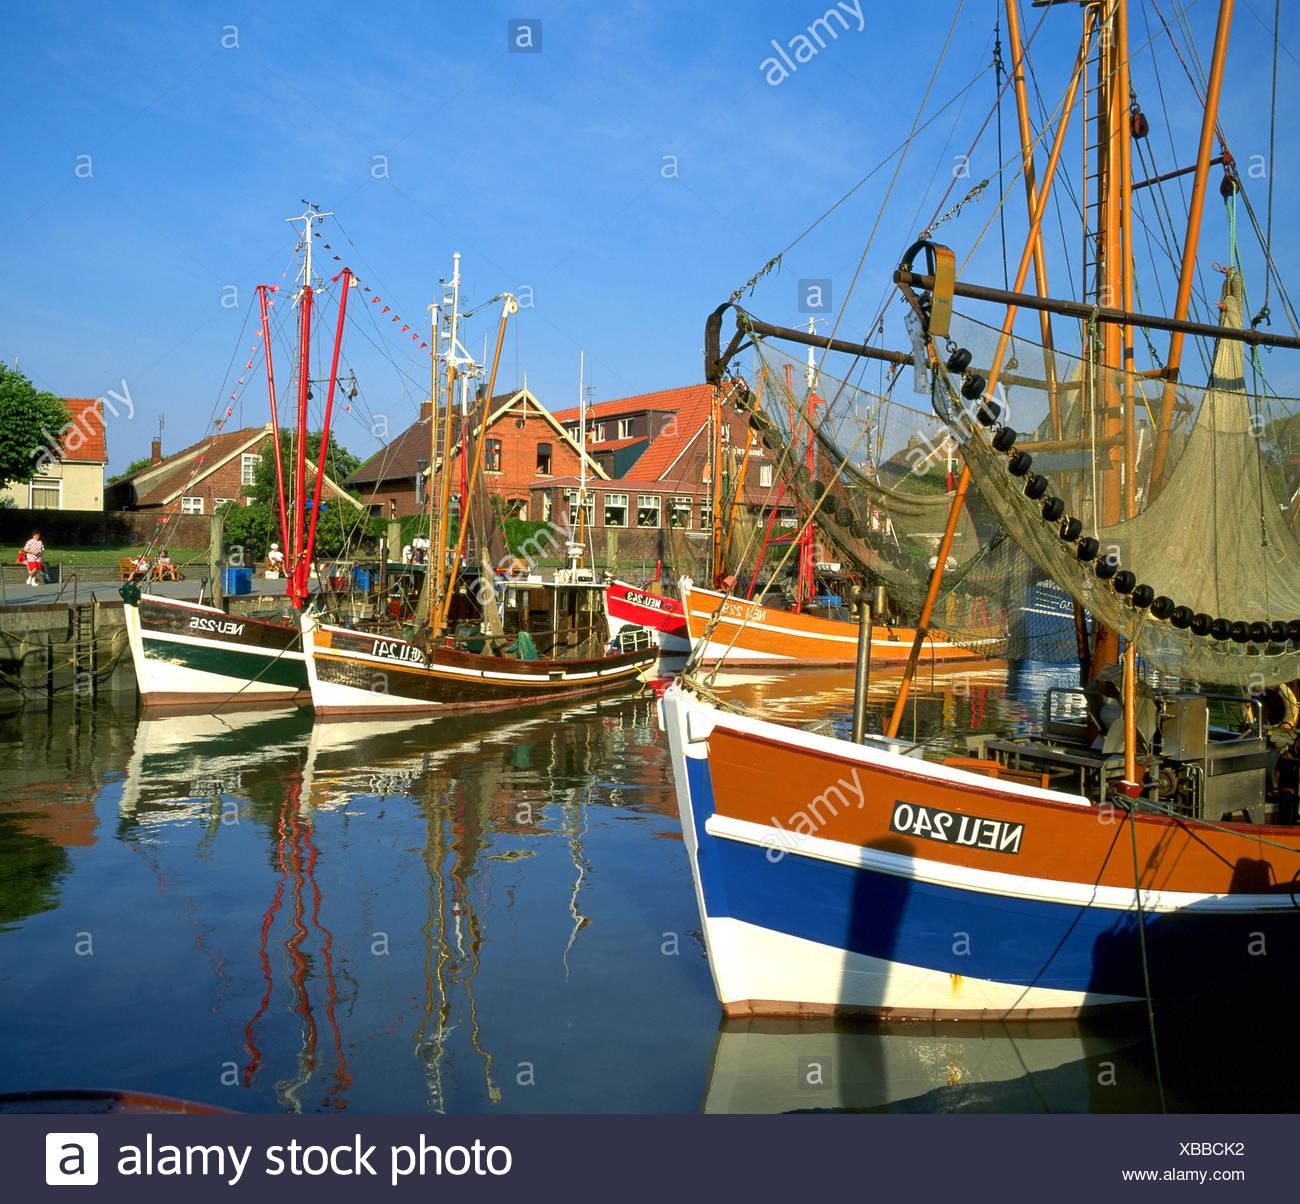 Fisher Boats In A Harbor Germany Lower Saxony East Frisia Neuharlingersiel